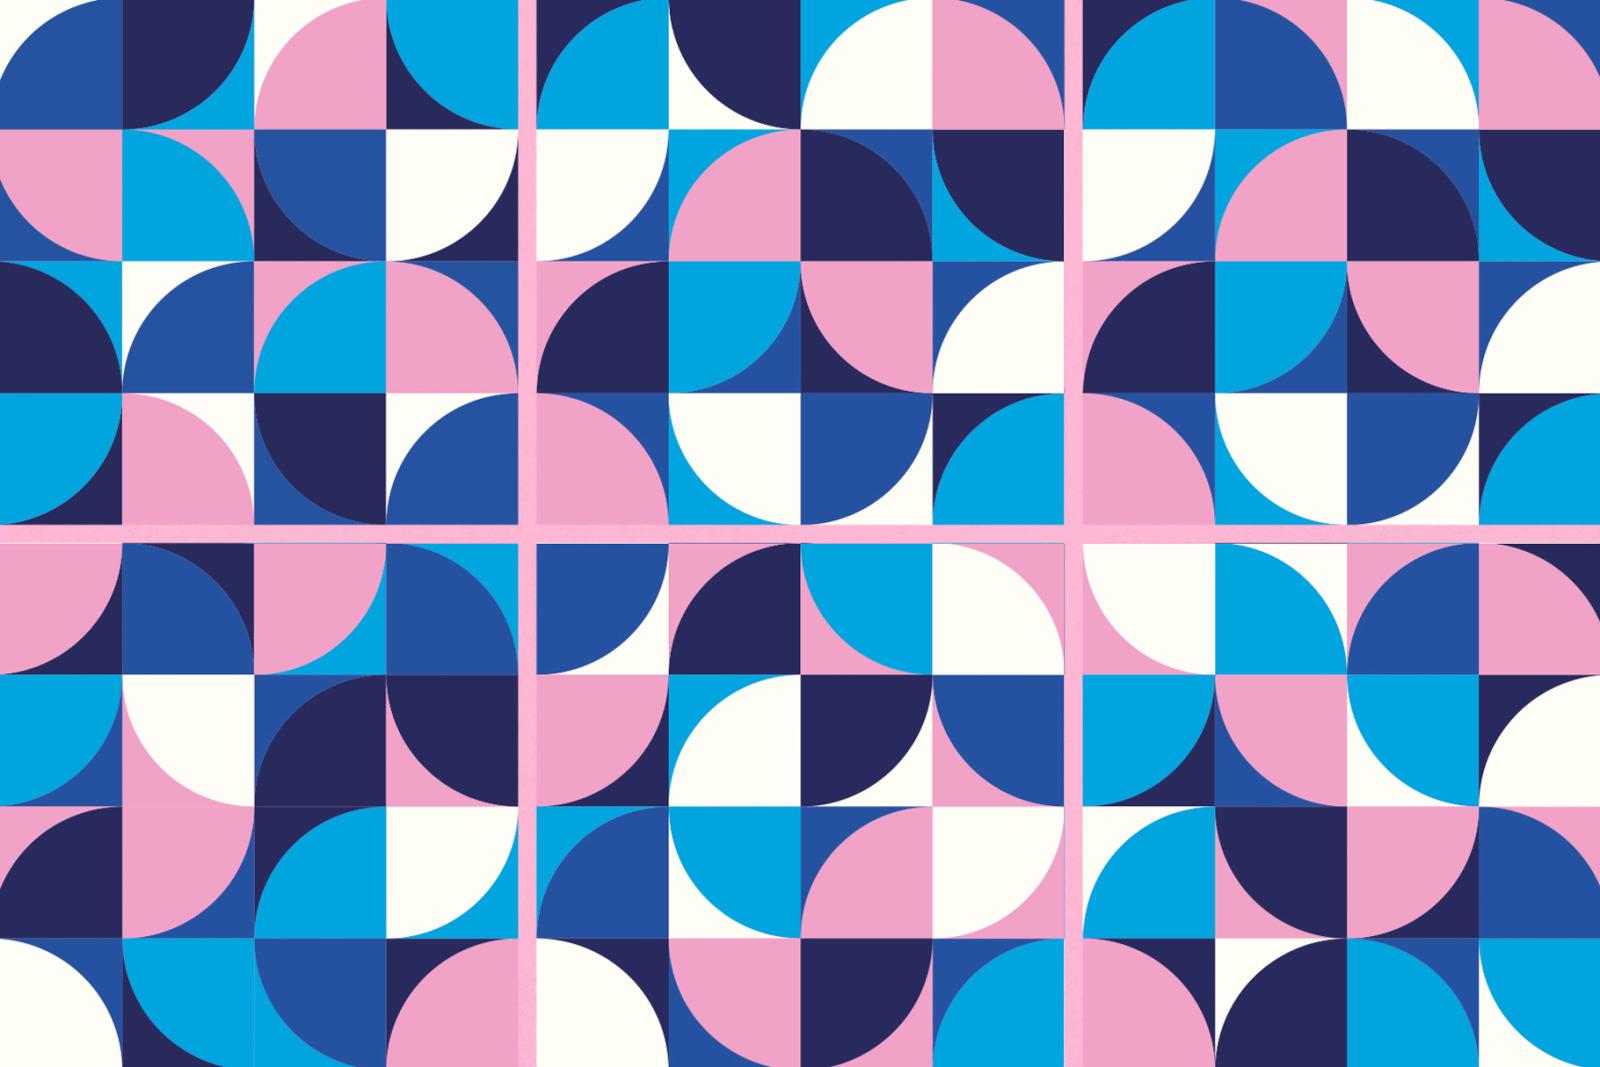 Geometric Shapes Patterns